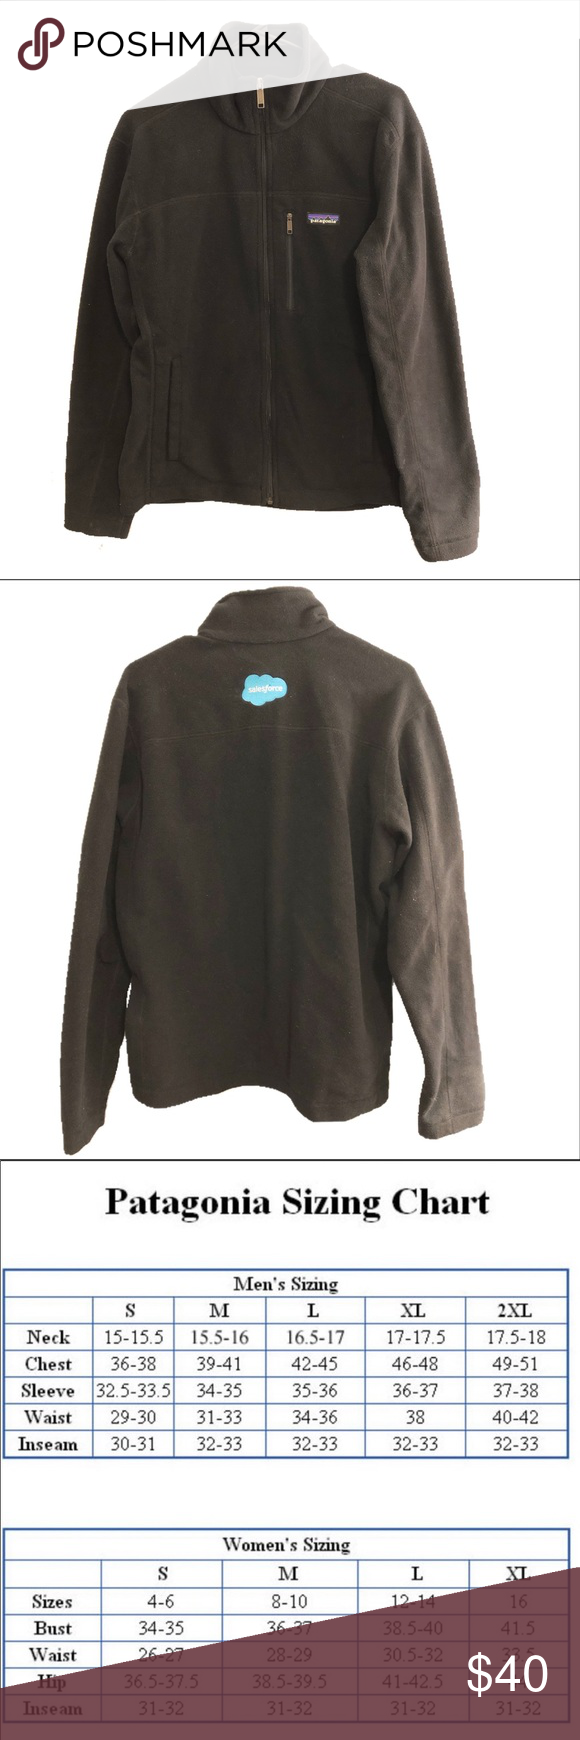 Black Patagonia Full Zip Fleece Jacket Euc Patagonia Perfect Condition Has A Salesforce Logo On Back Full Zip Pockets Clothes Design Fleece Jacket Fashion